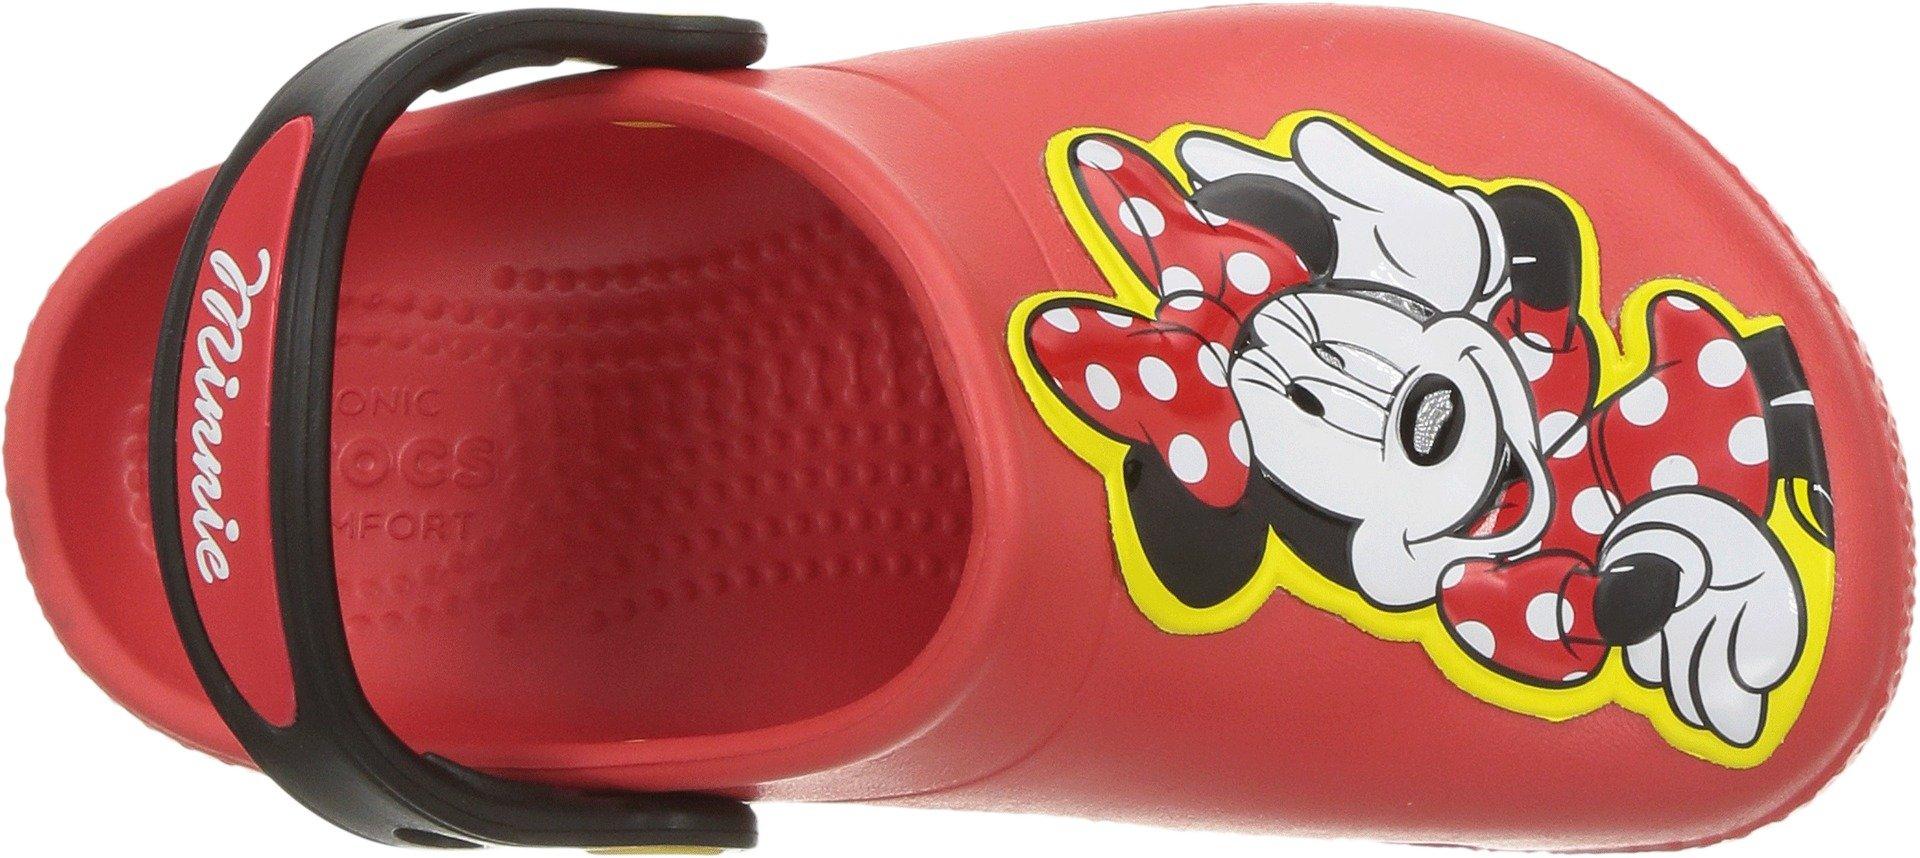 Crocs Girls' Fun Lab Minnie Clog, Flame, 8 M US Toddler by Crocs (Image #2)